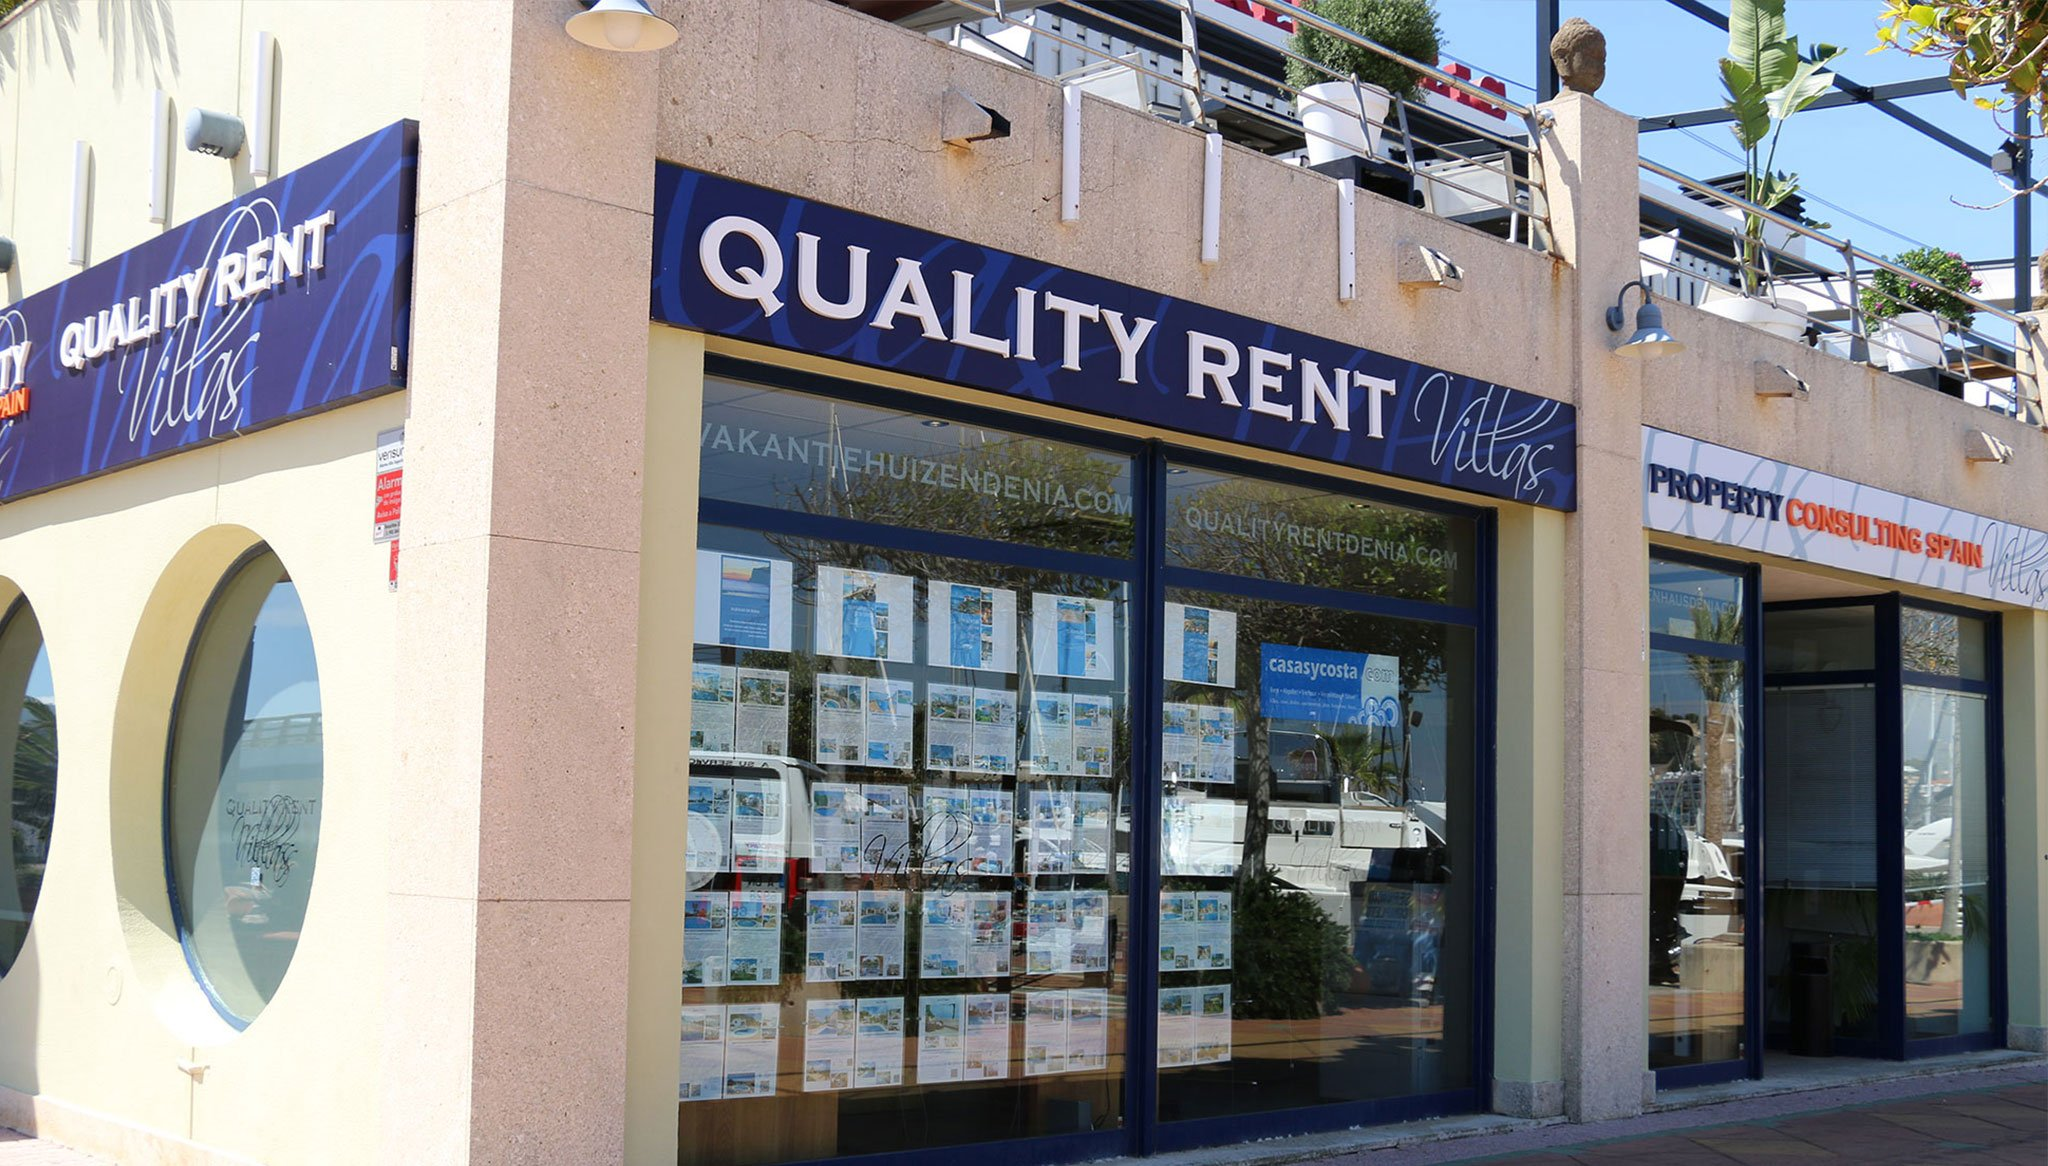 Gevelkwaliteit Rent a Villa